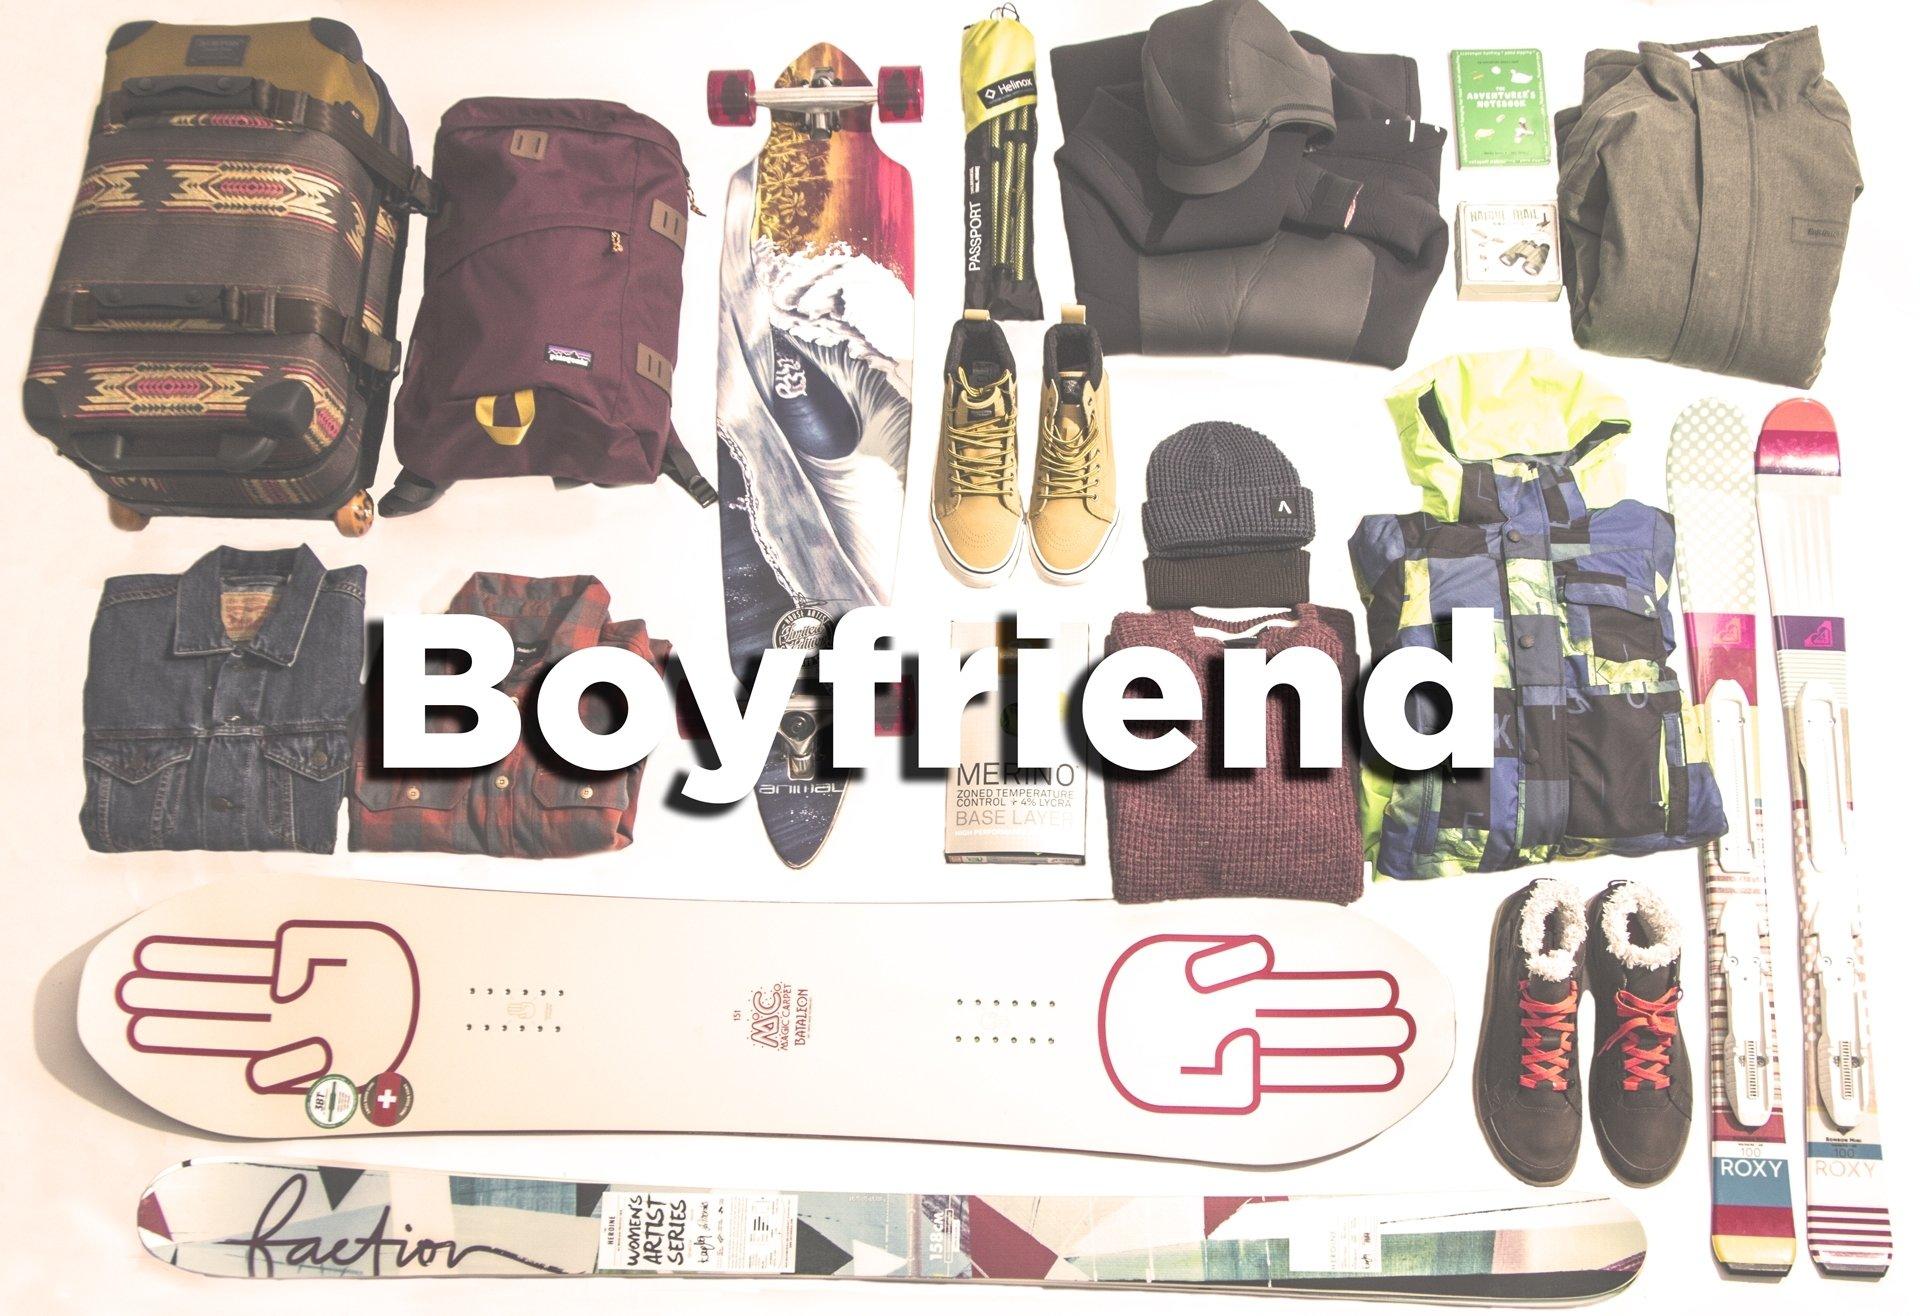 10 Elegant Christmas Present Ideas For Boyfriend christmas gift ideas for a boyfriend 15 great gifts